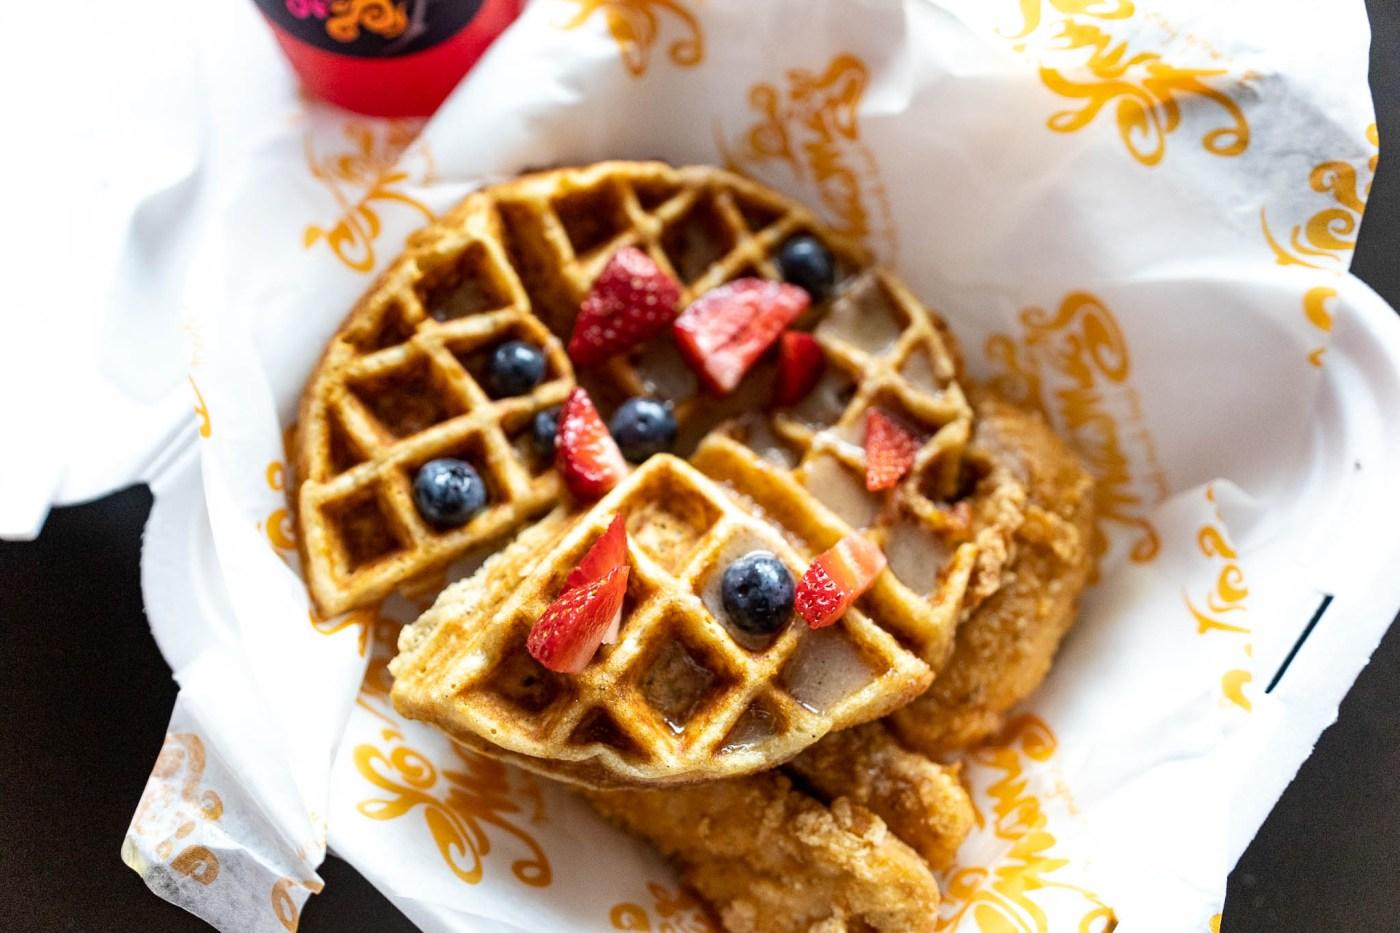 Yo Mama's chicken and waffles